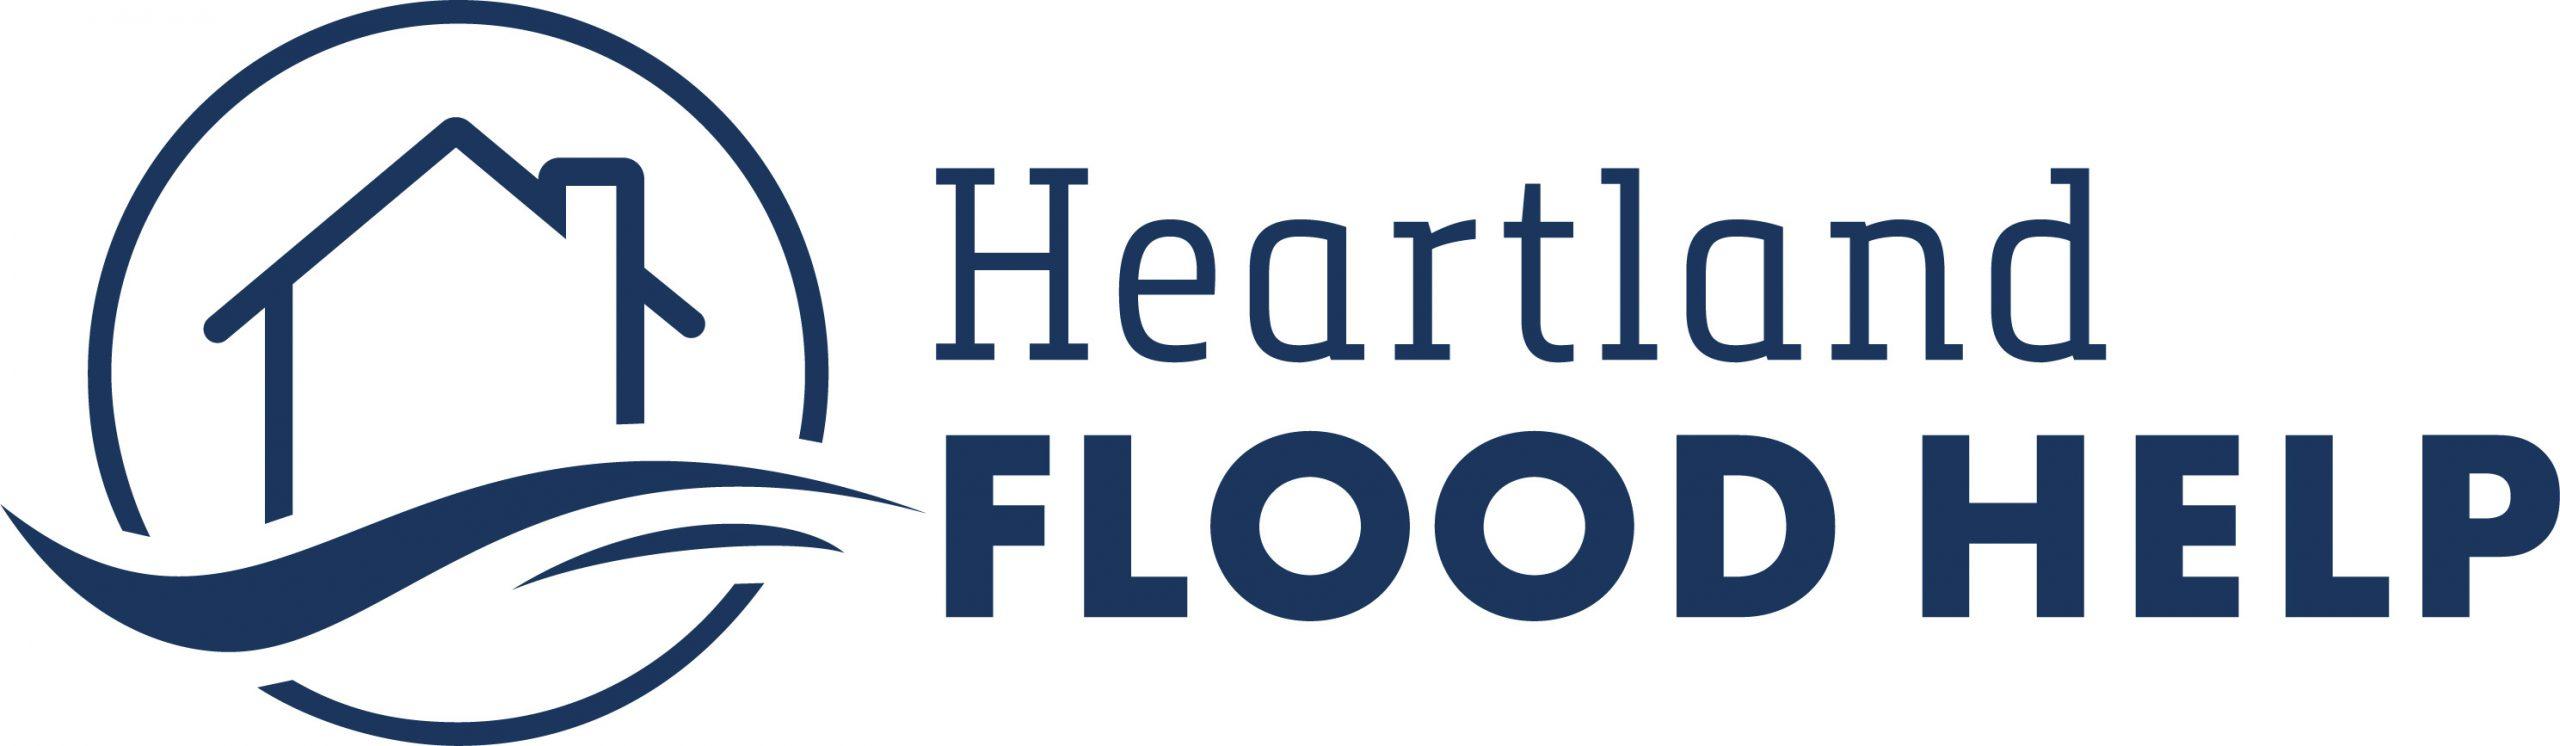 Heartland Flood Help logo